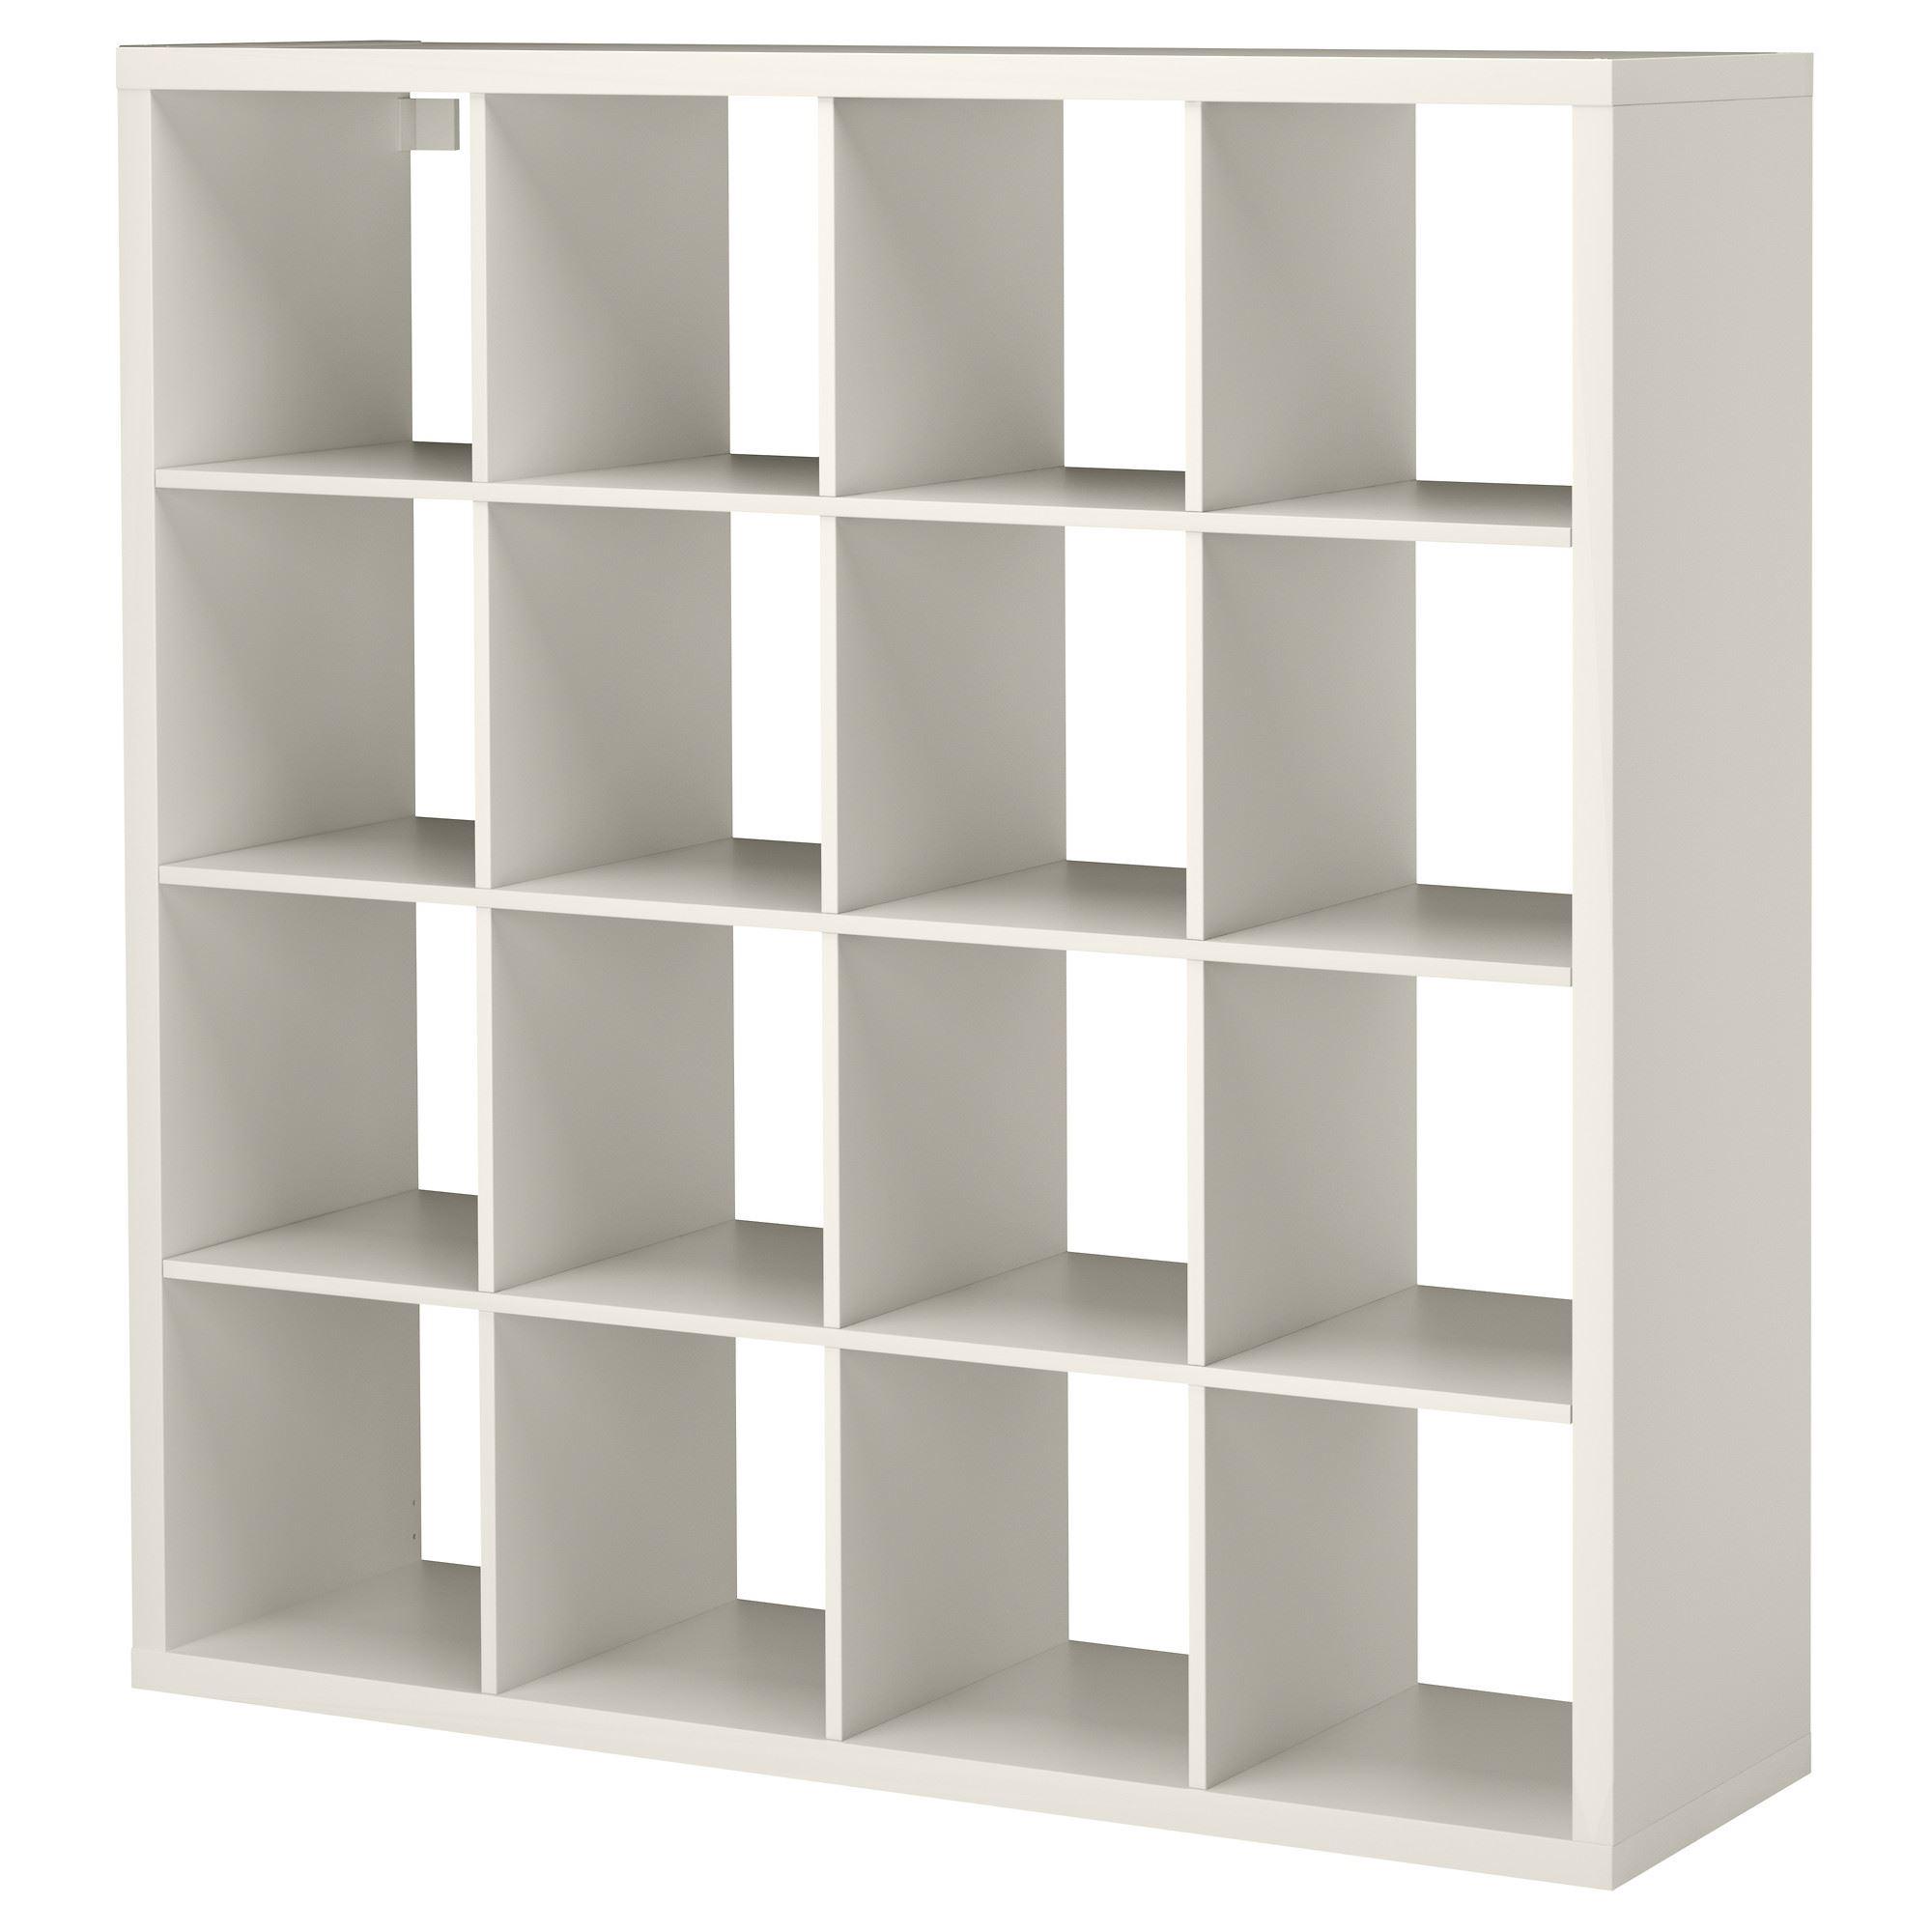 Regal ikea kallax  KALLAX shelving unit with 16 compartments white 147x39x147 cm ...